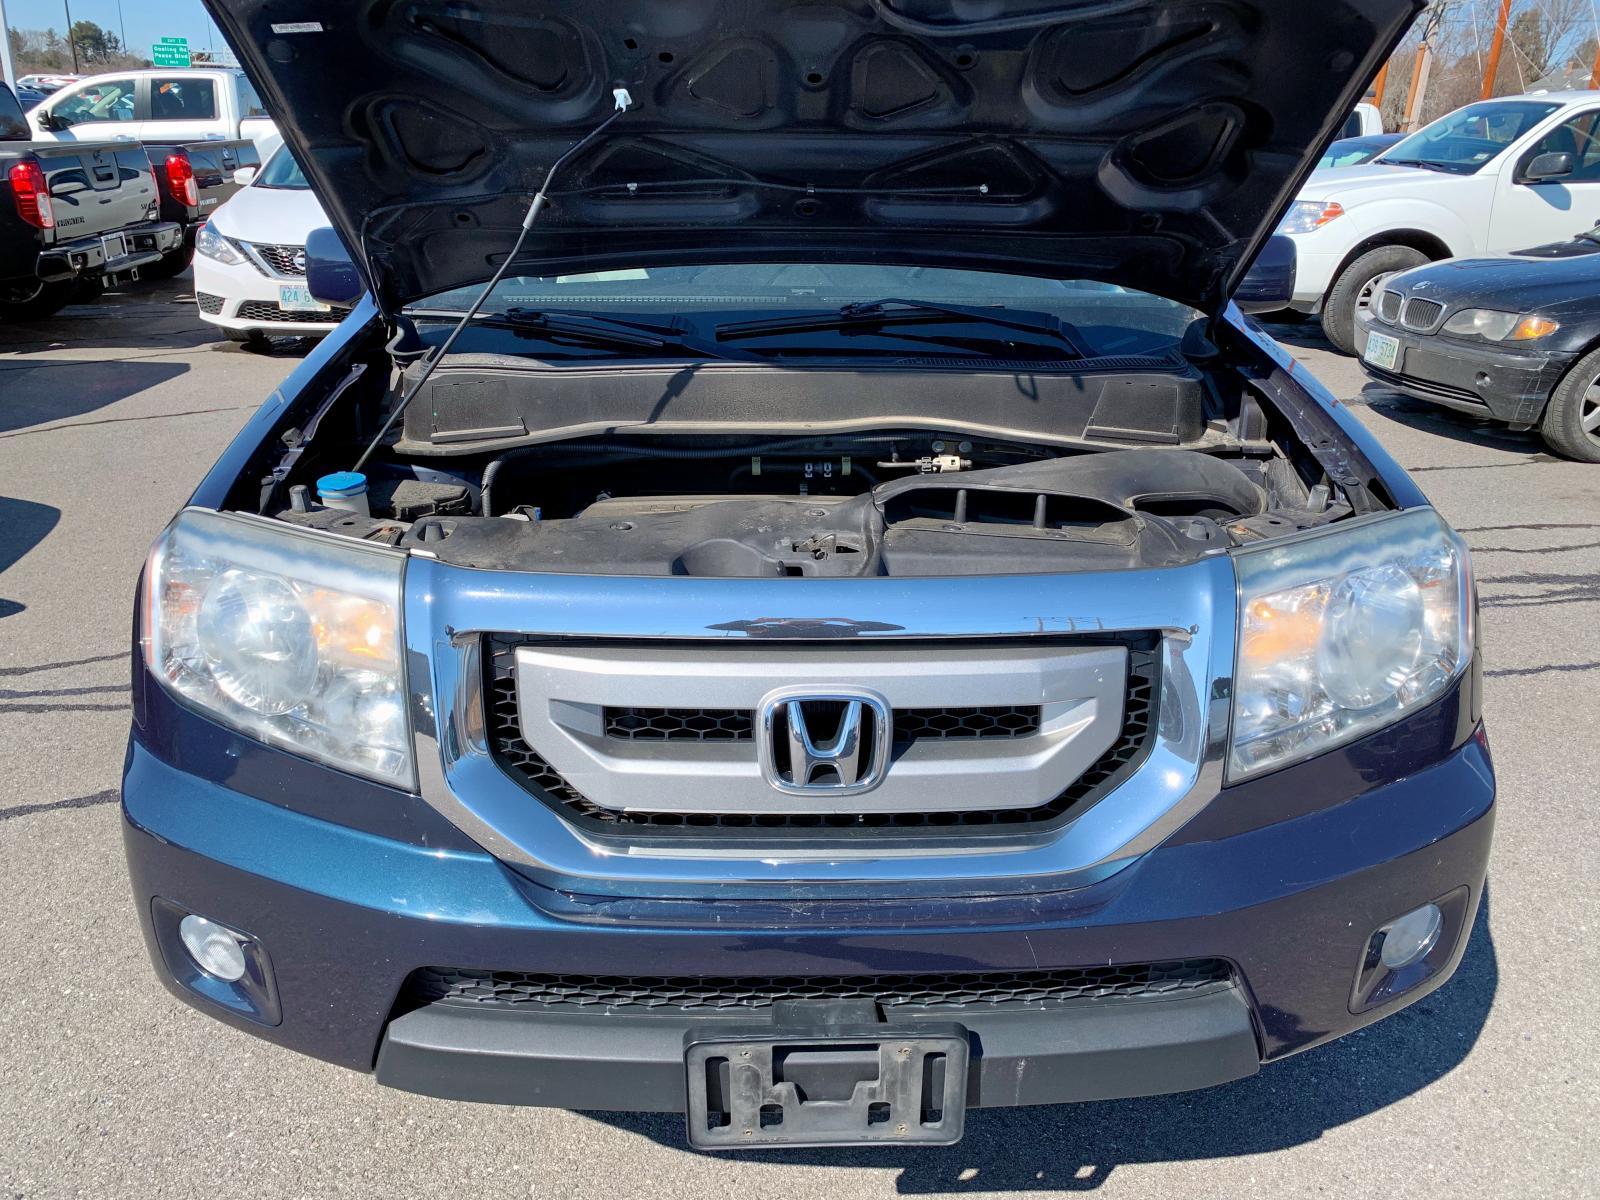 2011 Honda Pilot Exln 3.5L inside view